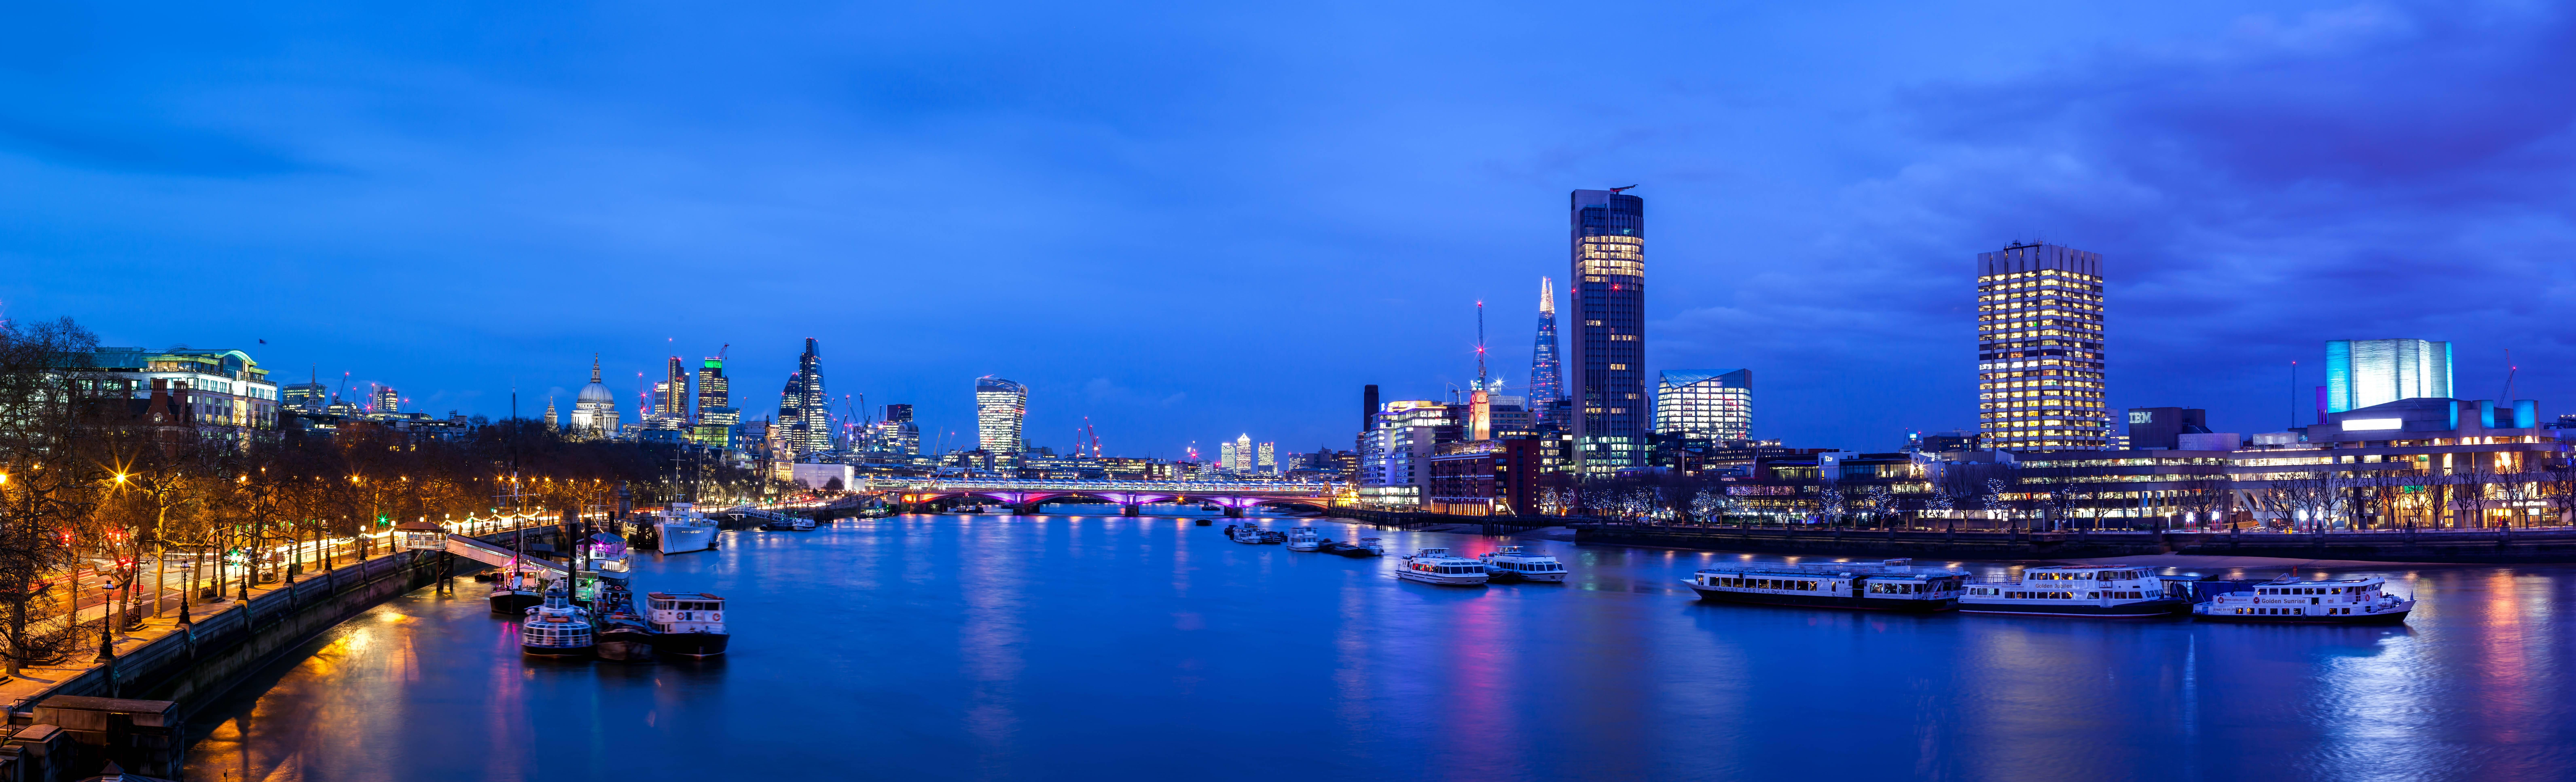 Великобритания, Лондон, Темза река